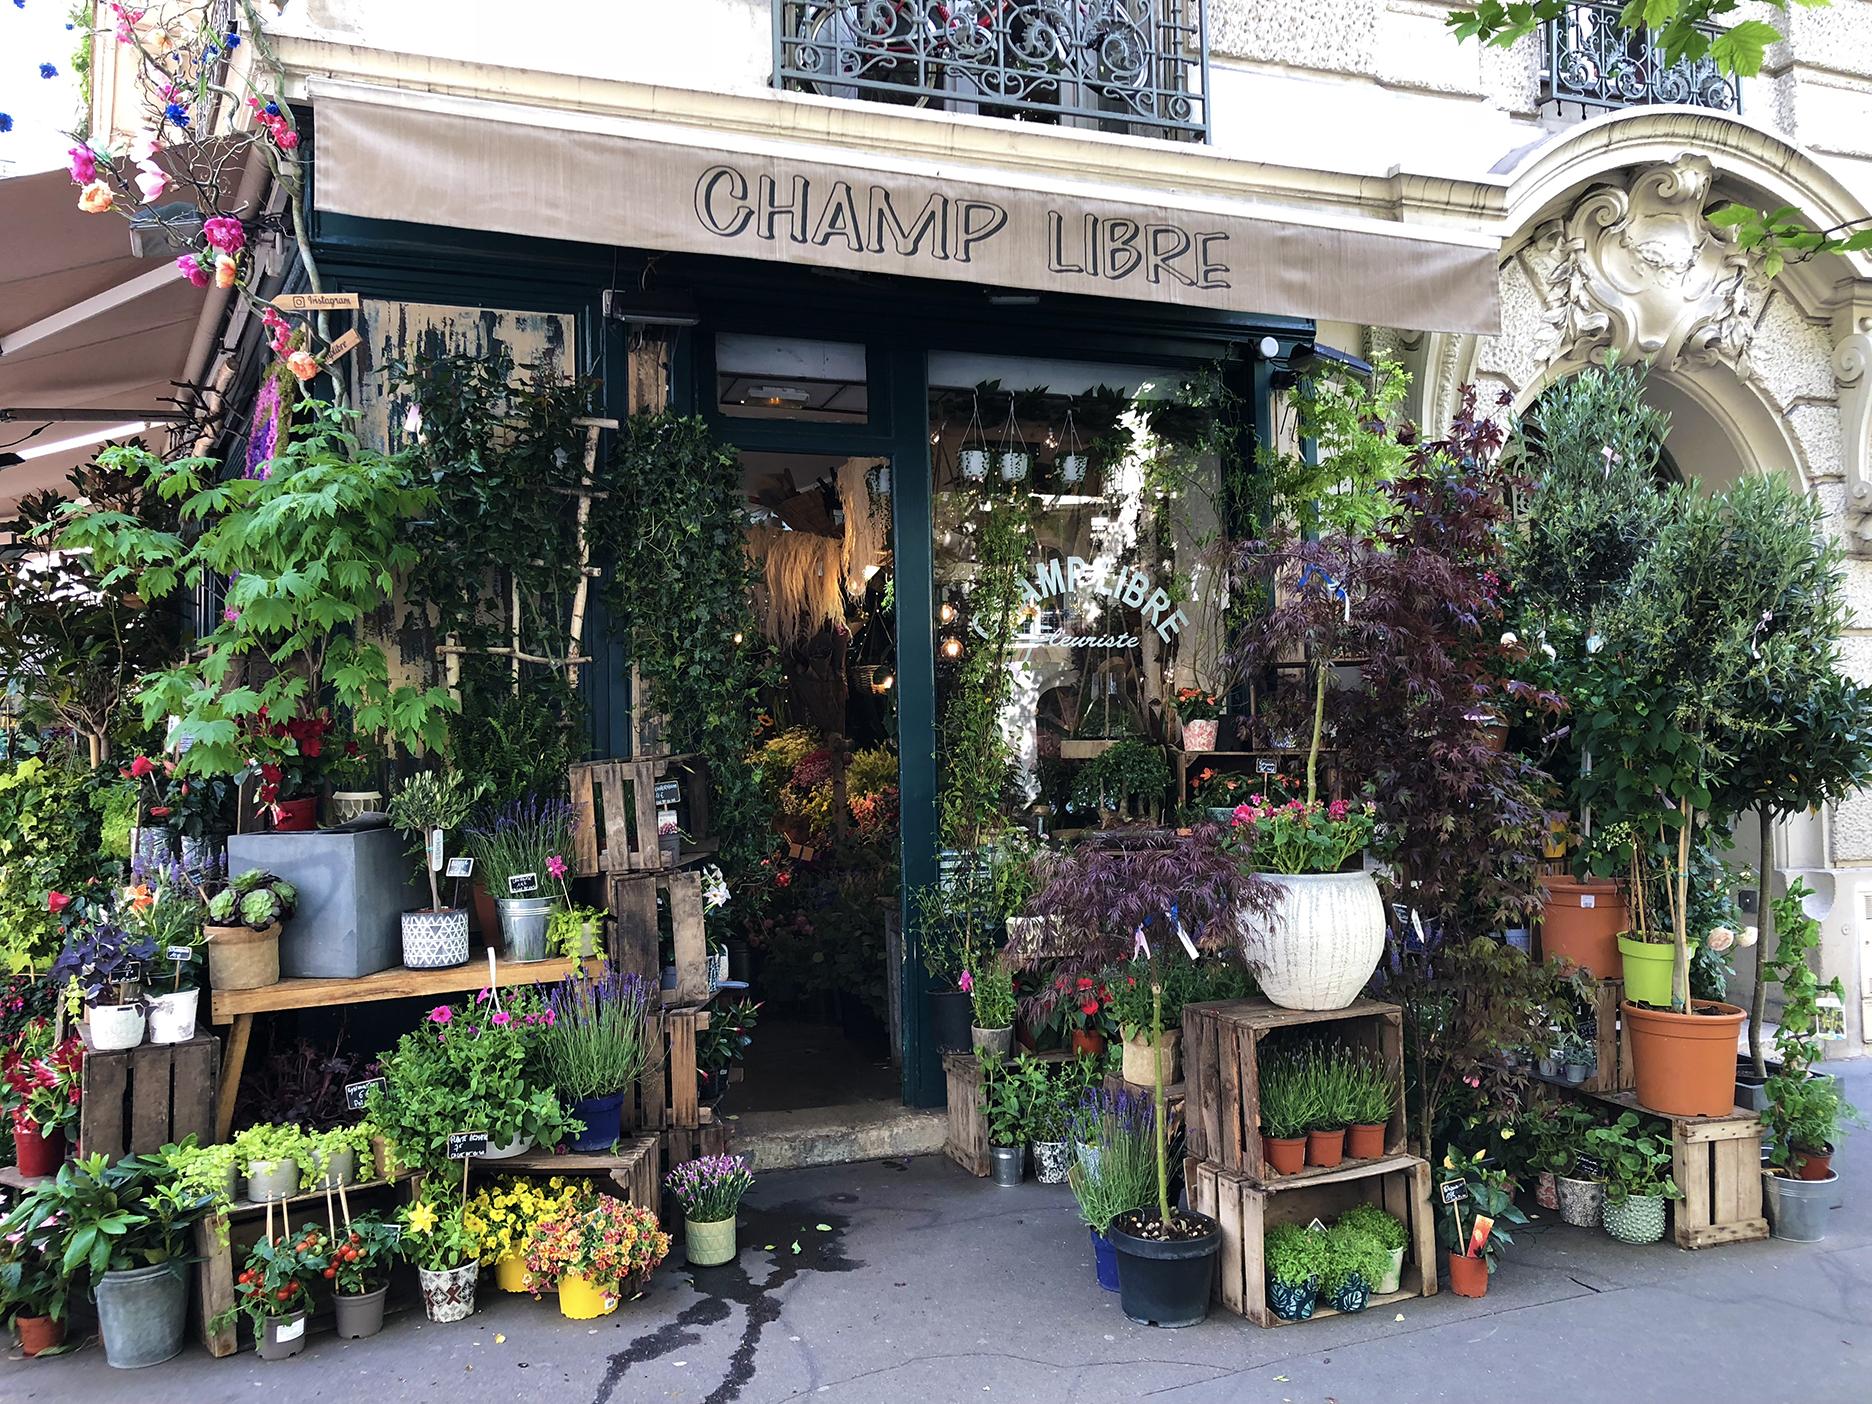 Floral shop at the corner of avenue Ledru-Rollin. Love the name.